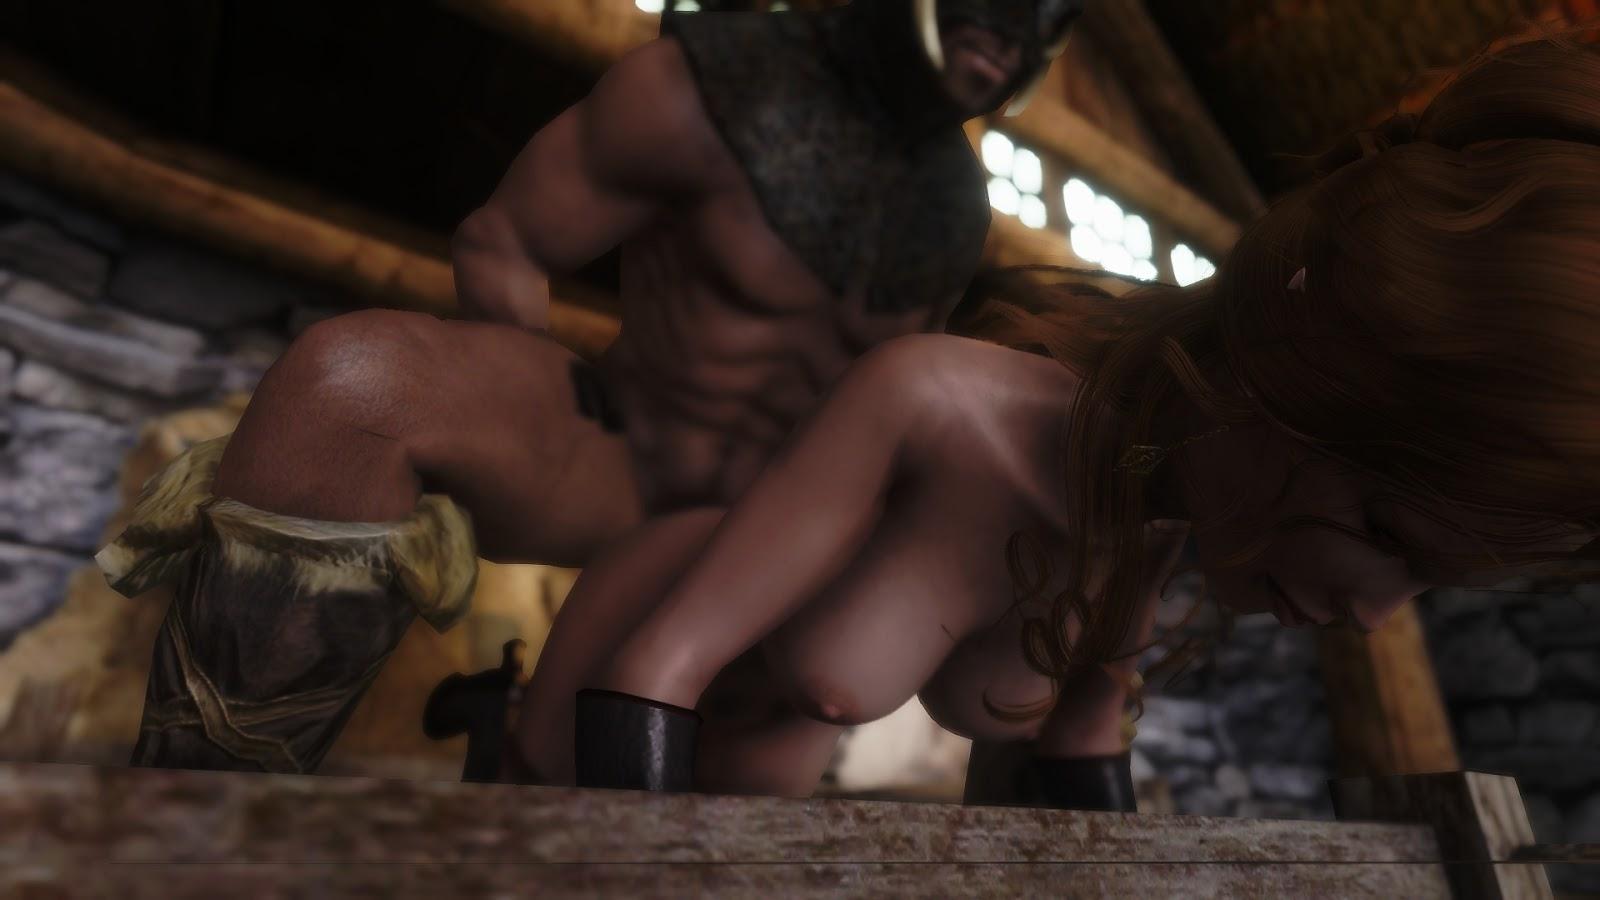 Skyrim mods textures nude pics adult unsencord sexy videos